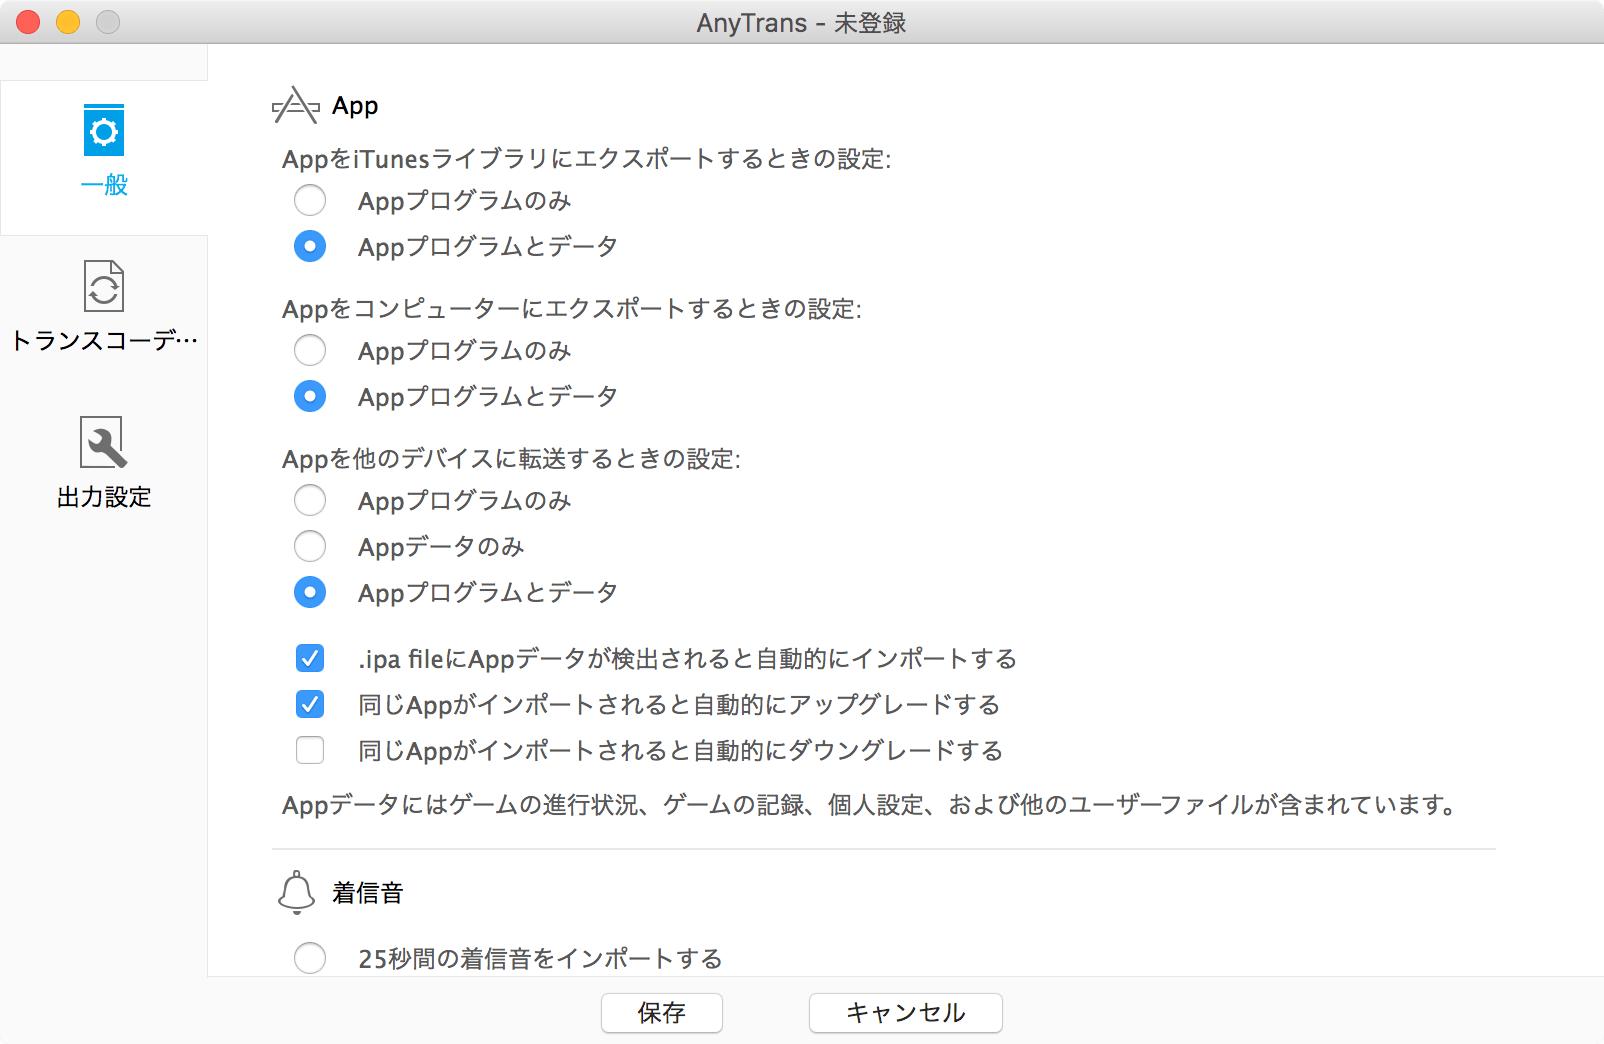 08_20160229_anytrans